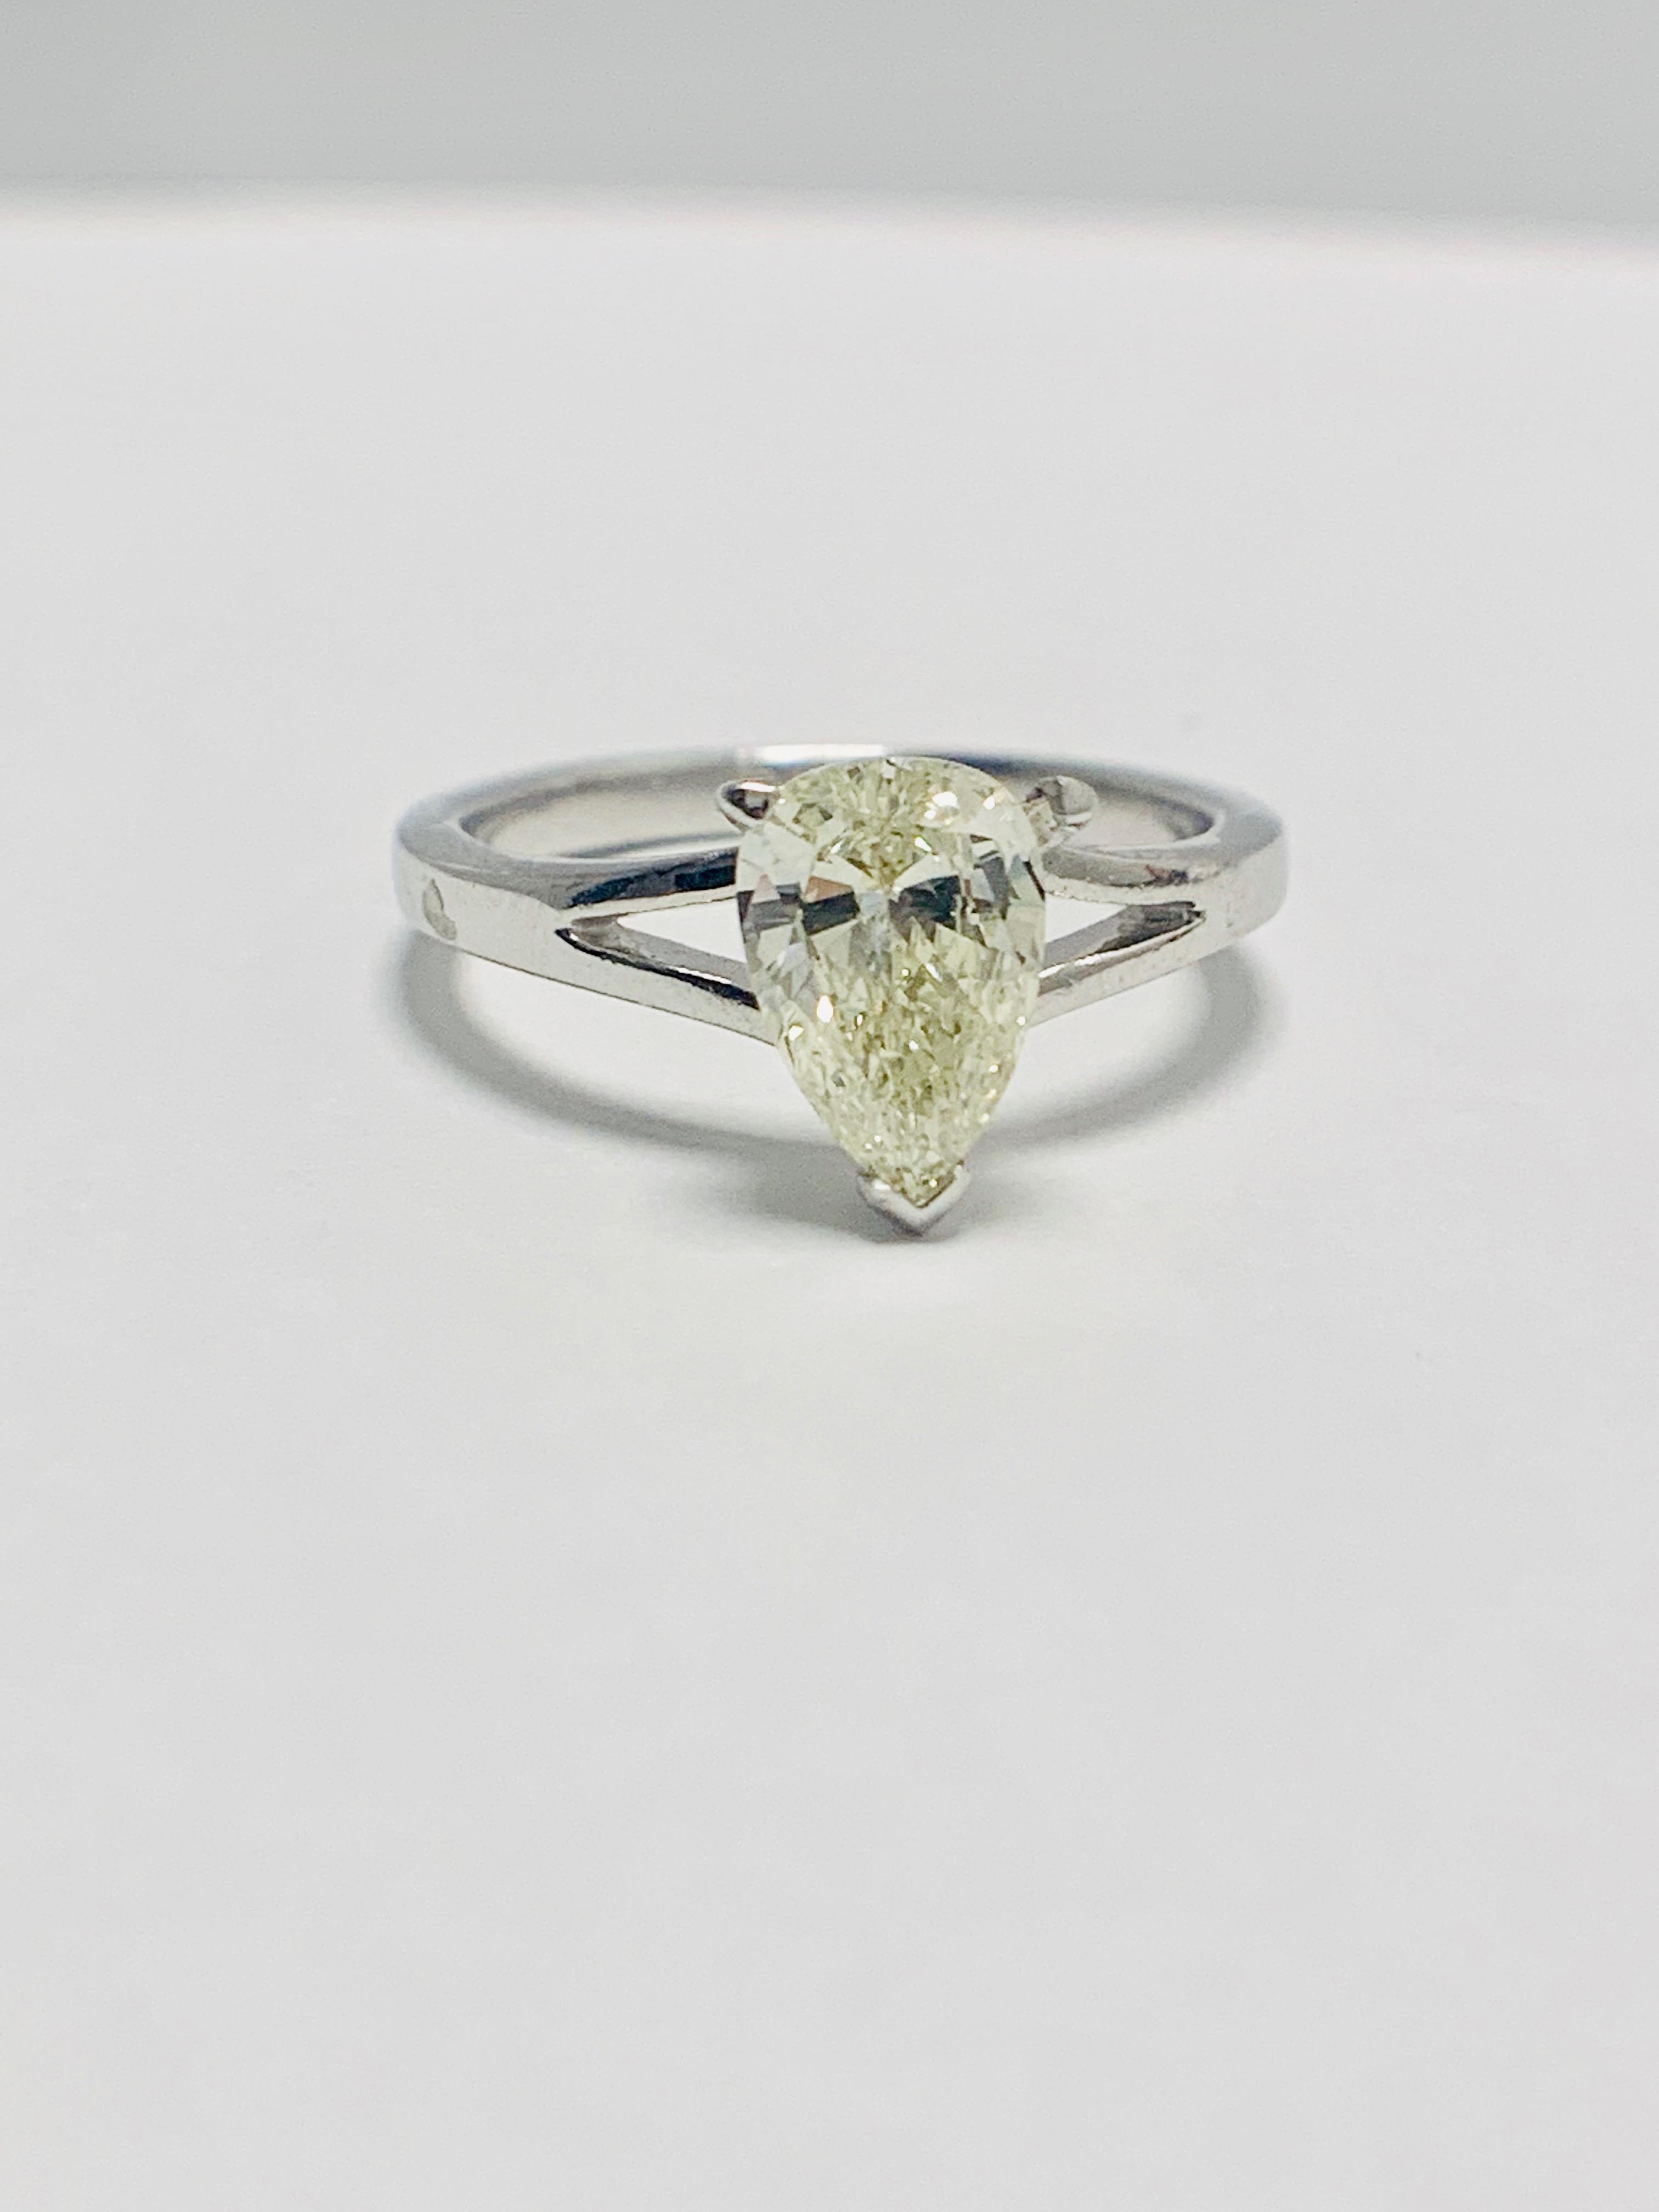 1ct Pearshape Diamond PLatinum Solitaire Ring. - Image 8 of 9